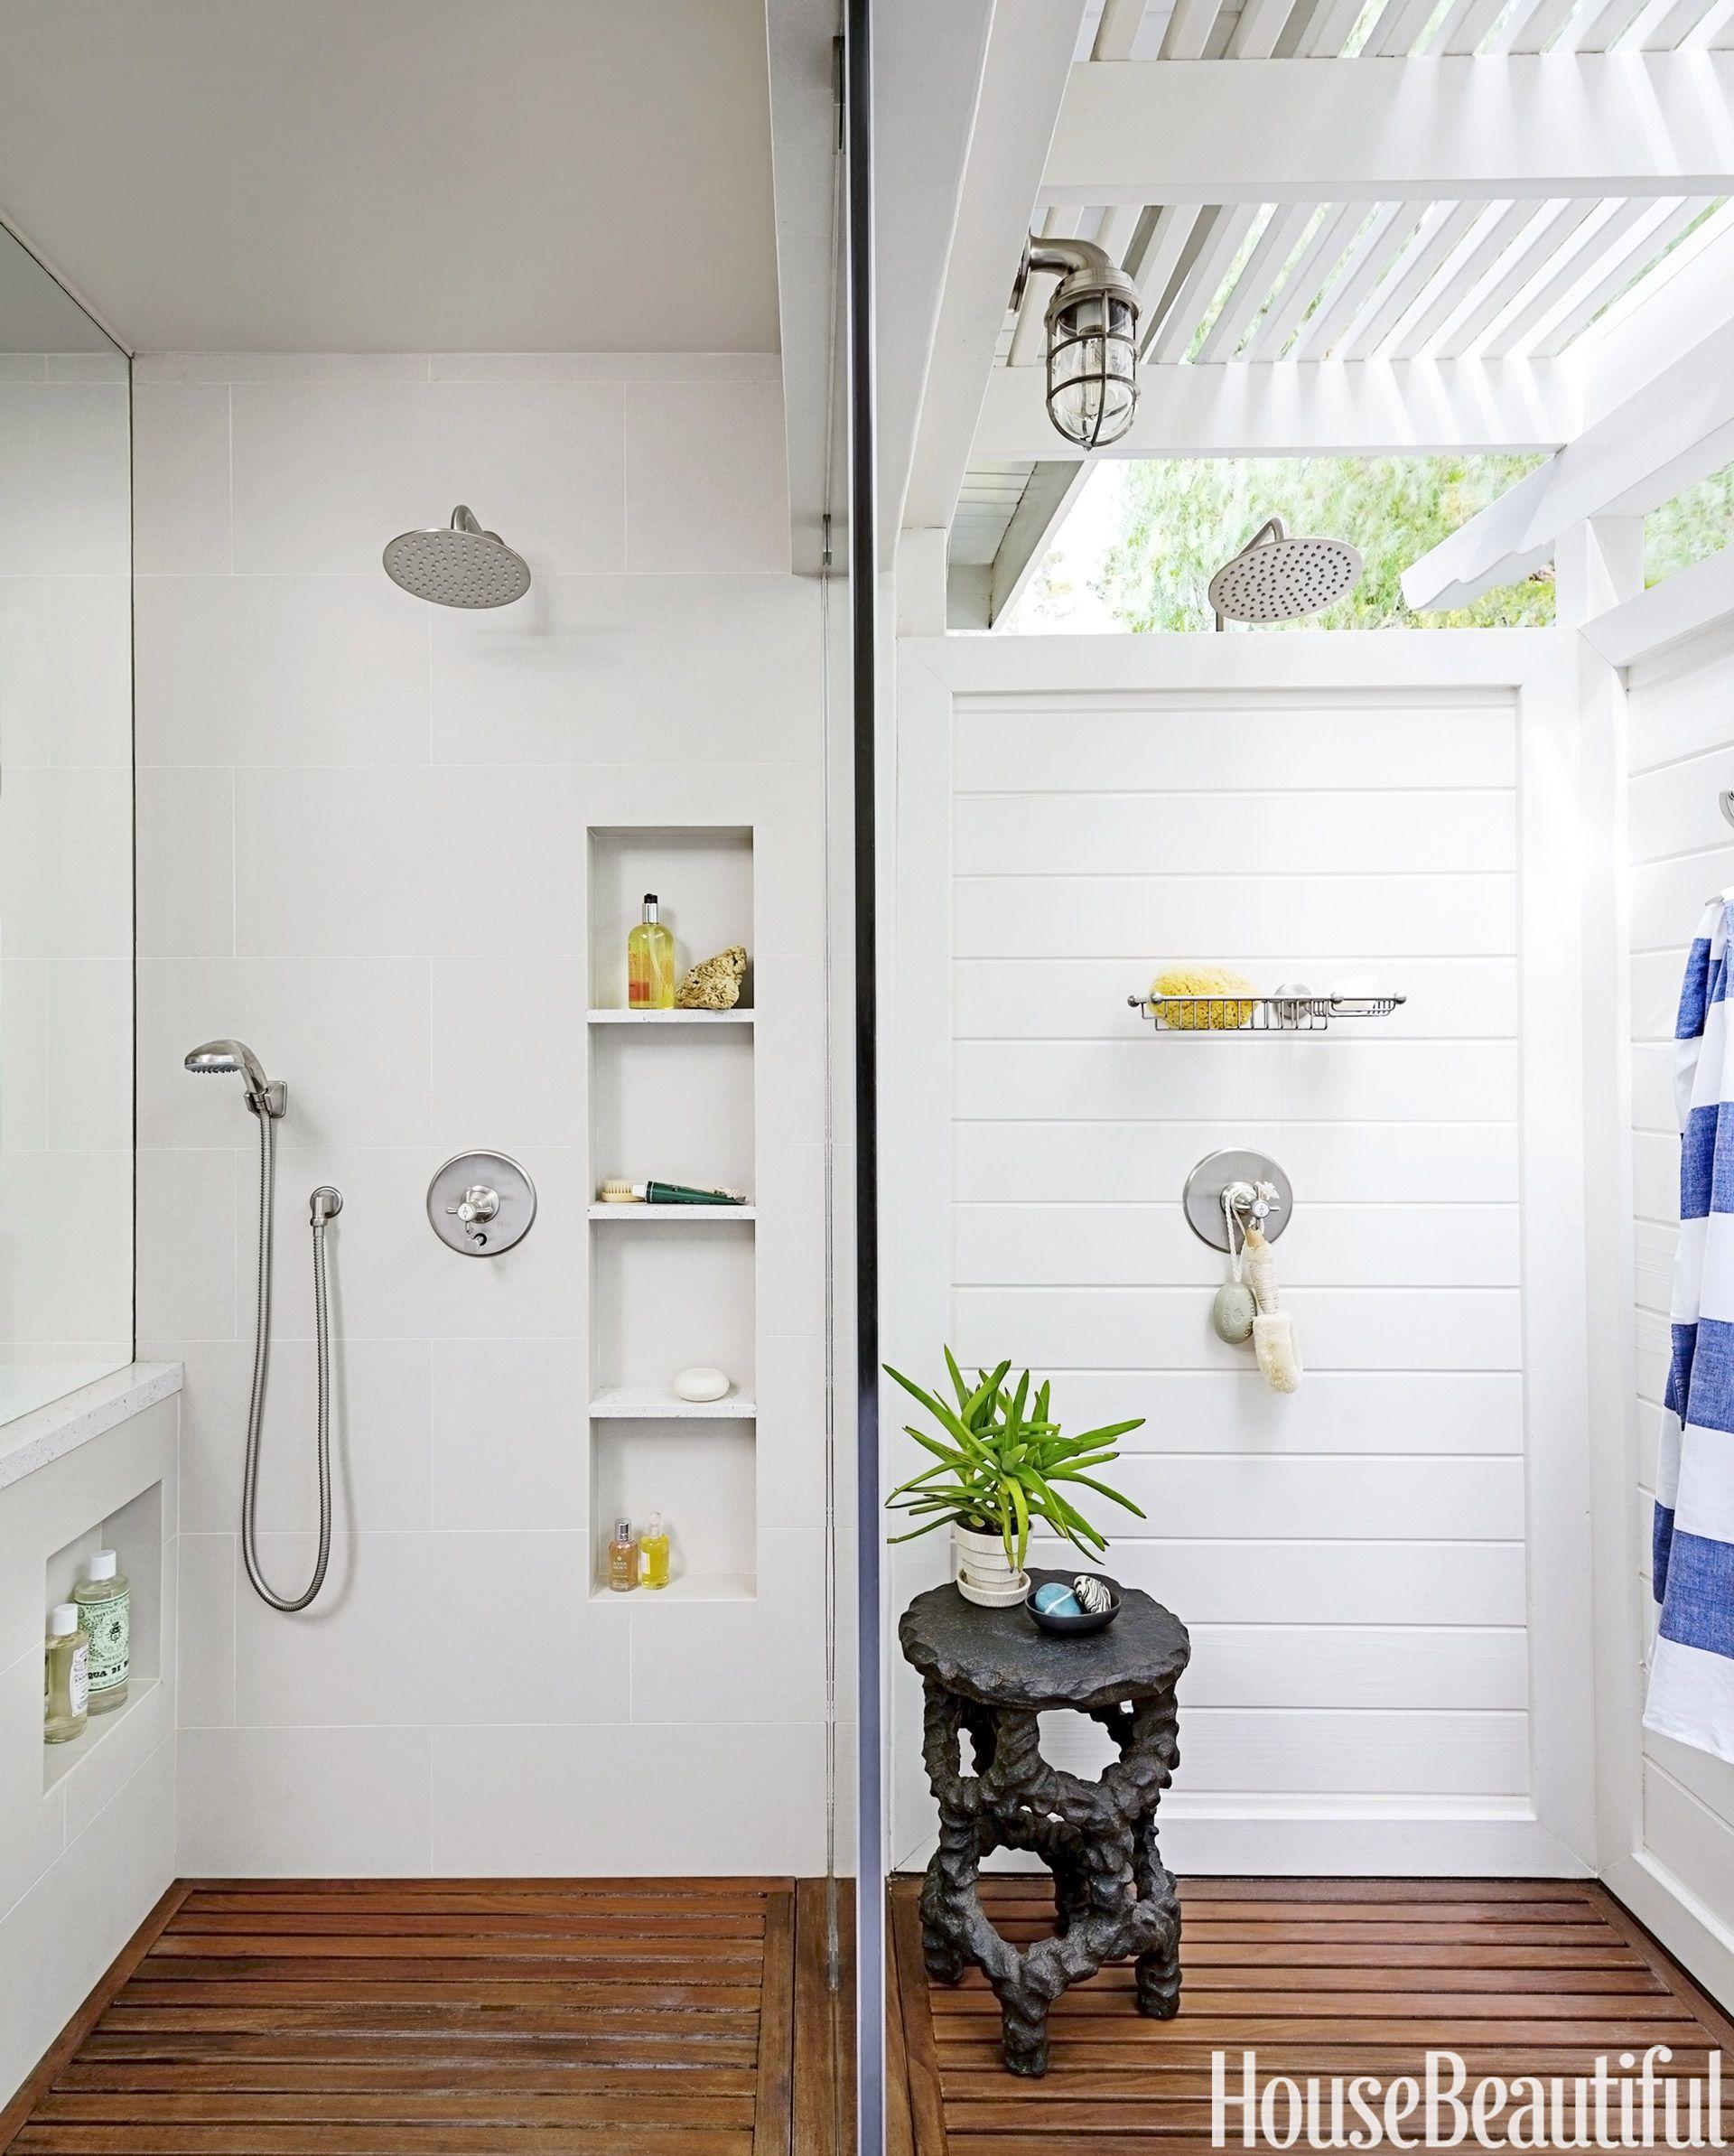 140 Ways to Make Any Bathroom Feel Like an At-Home Spa | Restoration ...